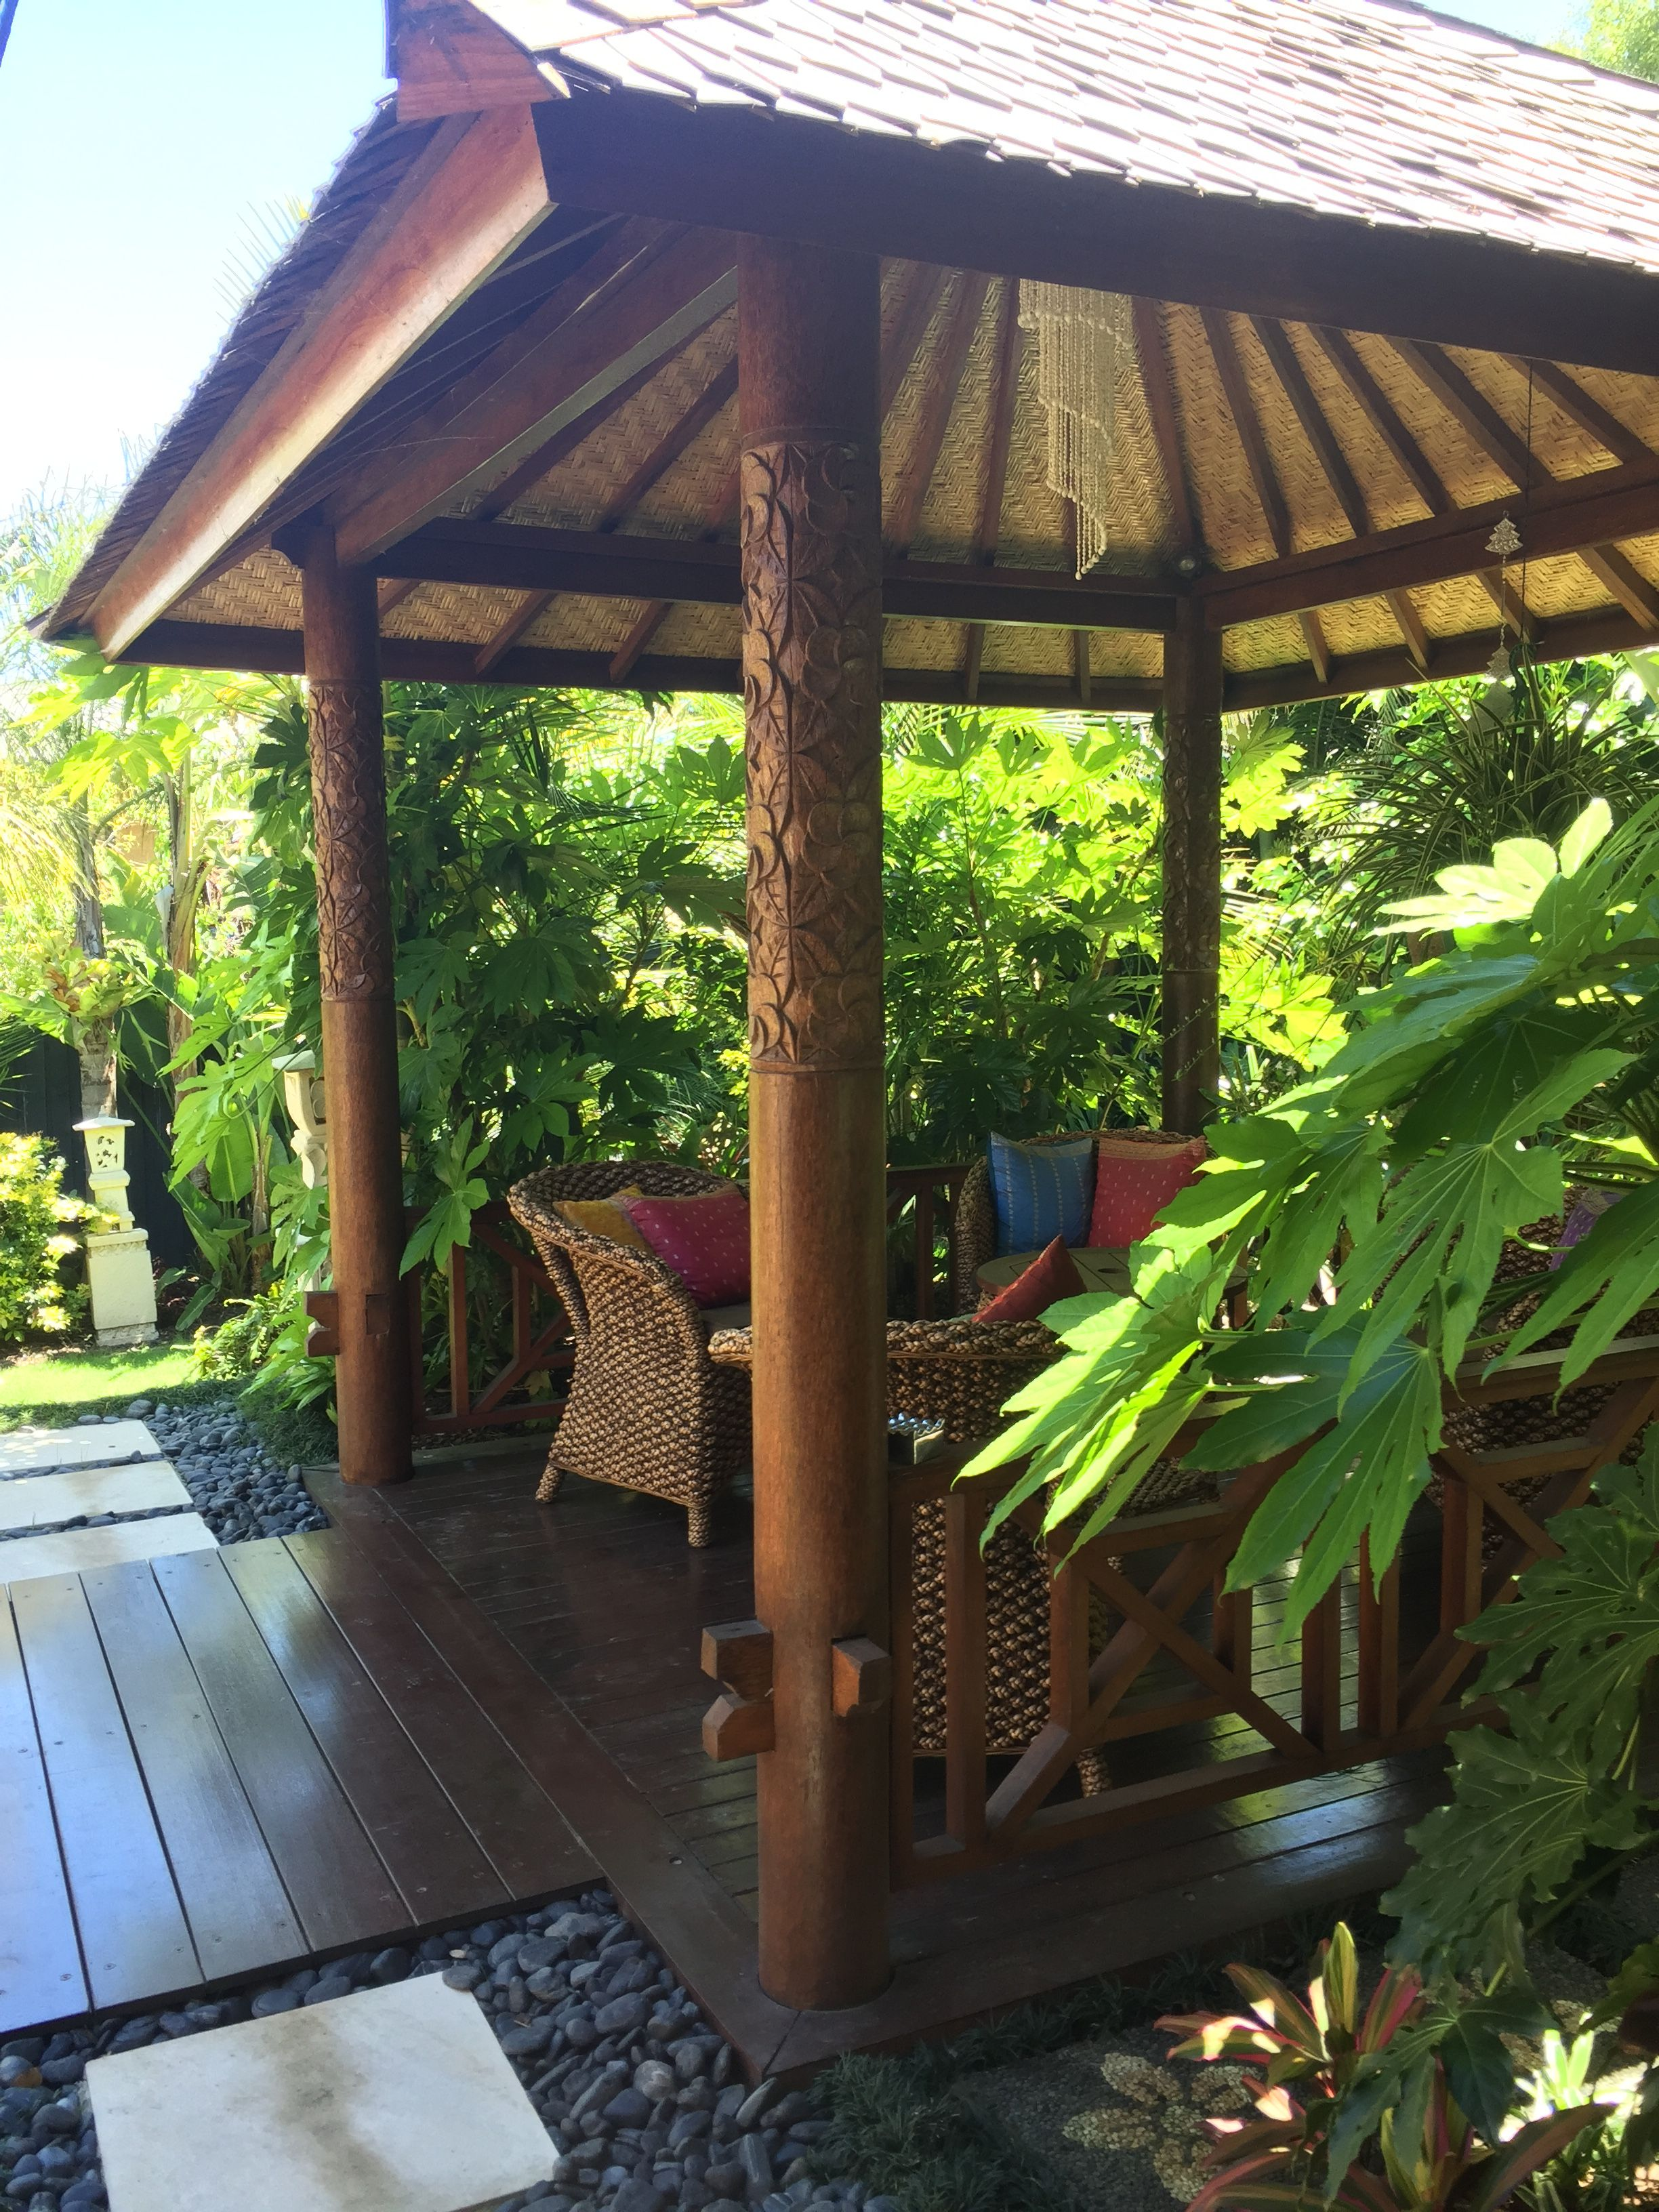 Balinese garden design by Melisa Dixon | YARD IMPROVEMENTS ...